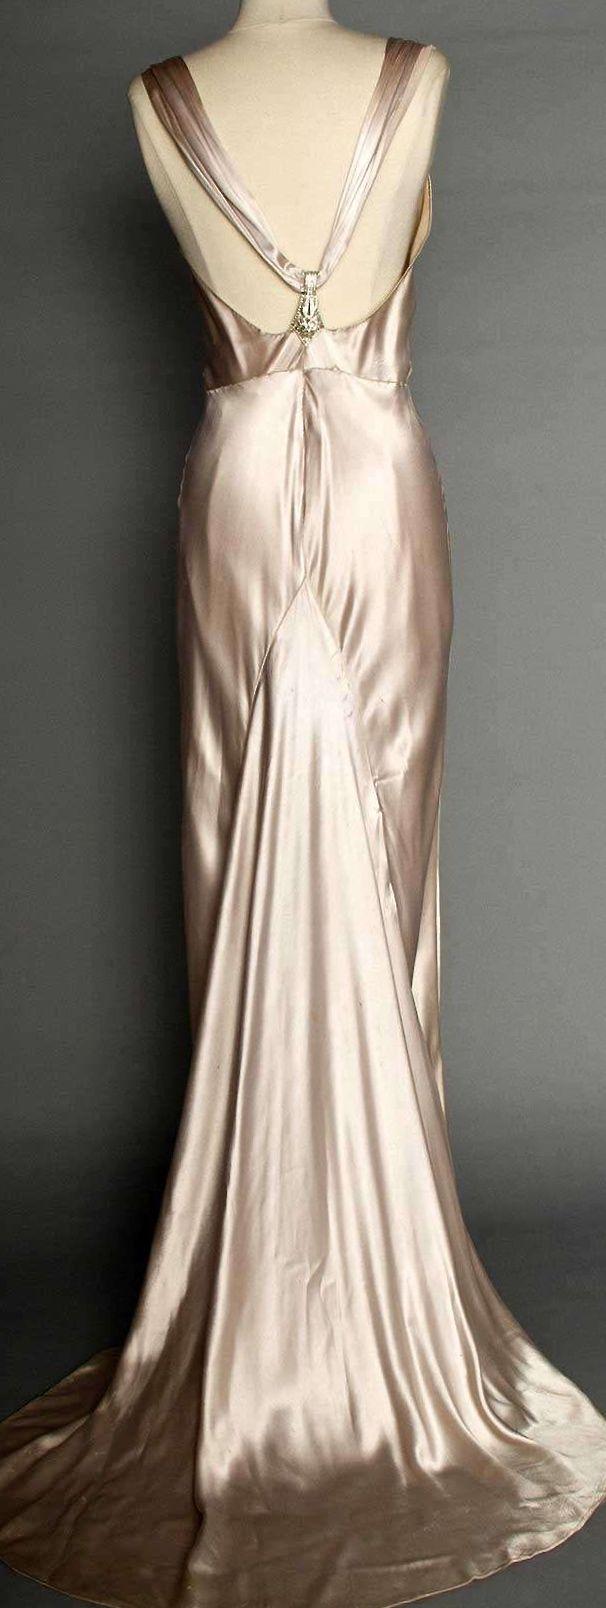 Abiti Eleganti Stile Anni 30.Satin Evening Gown C 1933 Anni 30 40 Vestaglie Vintage Stile